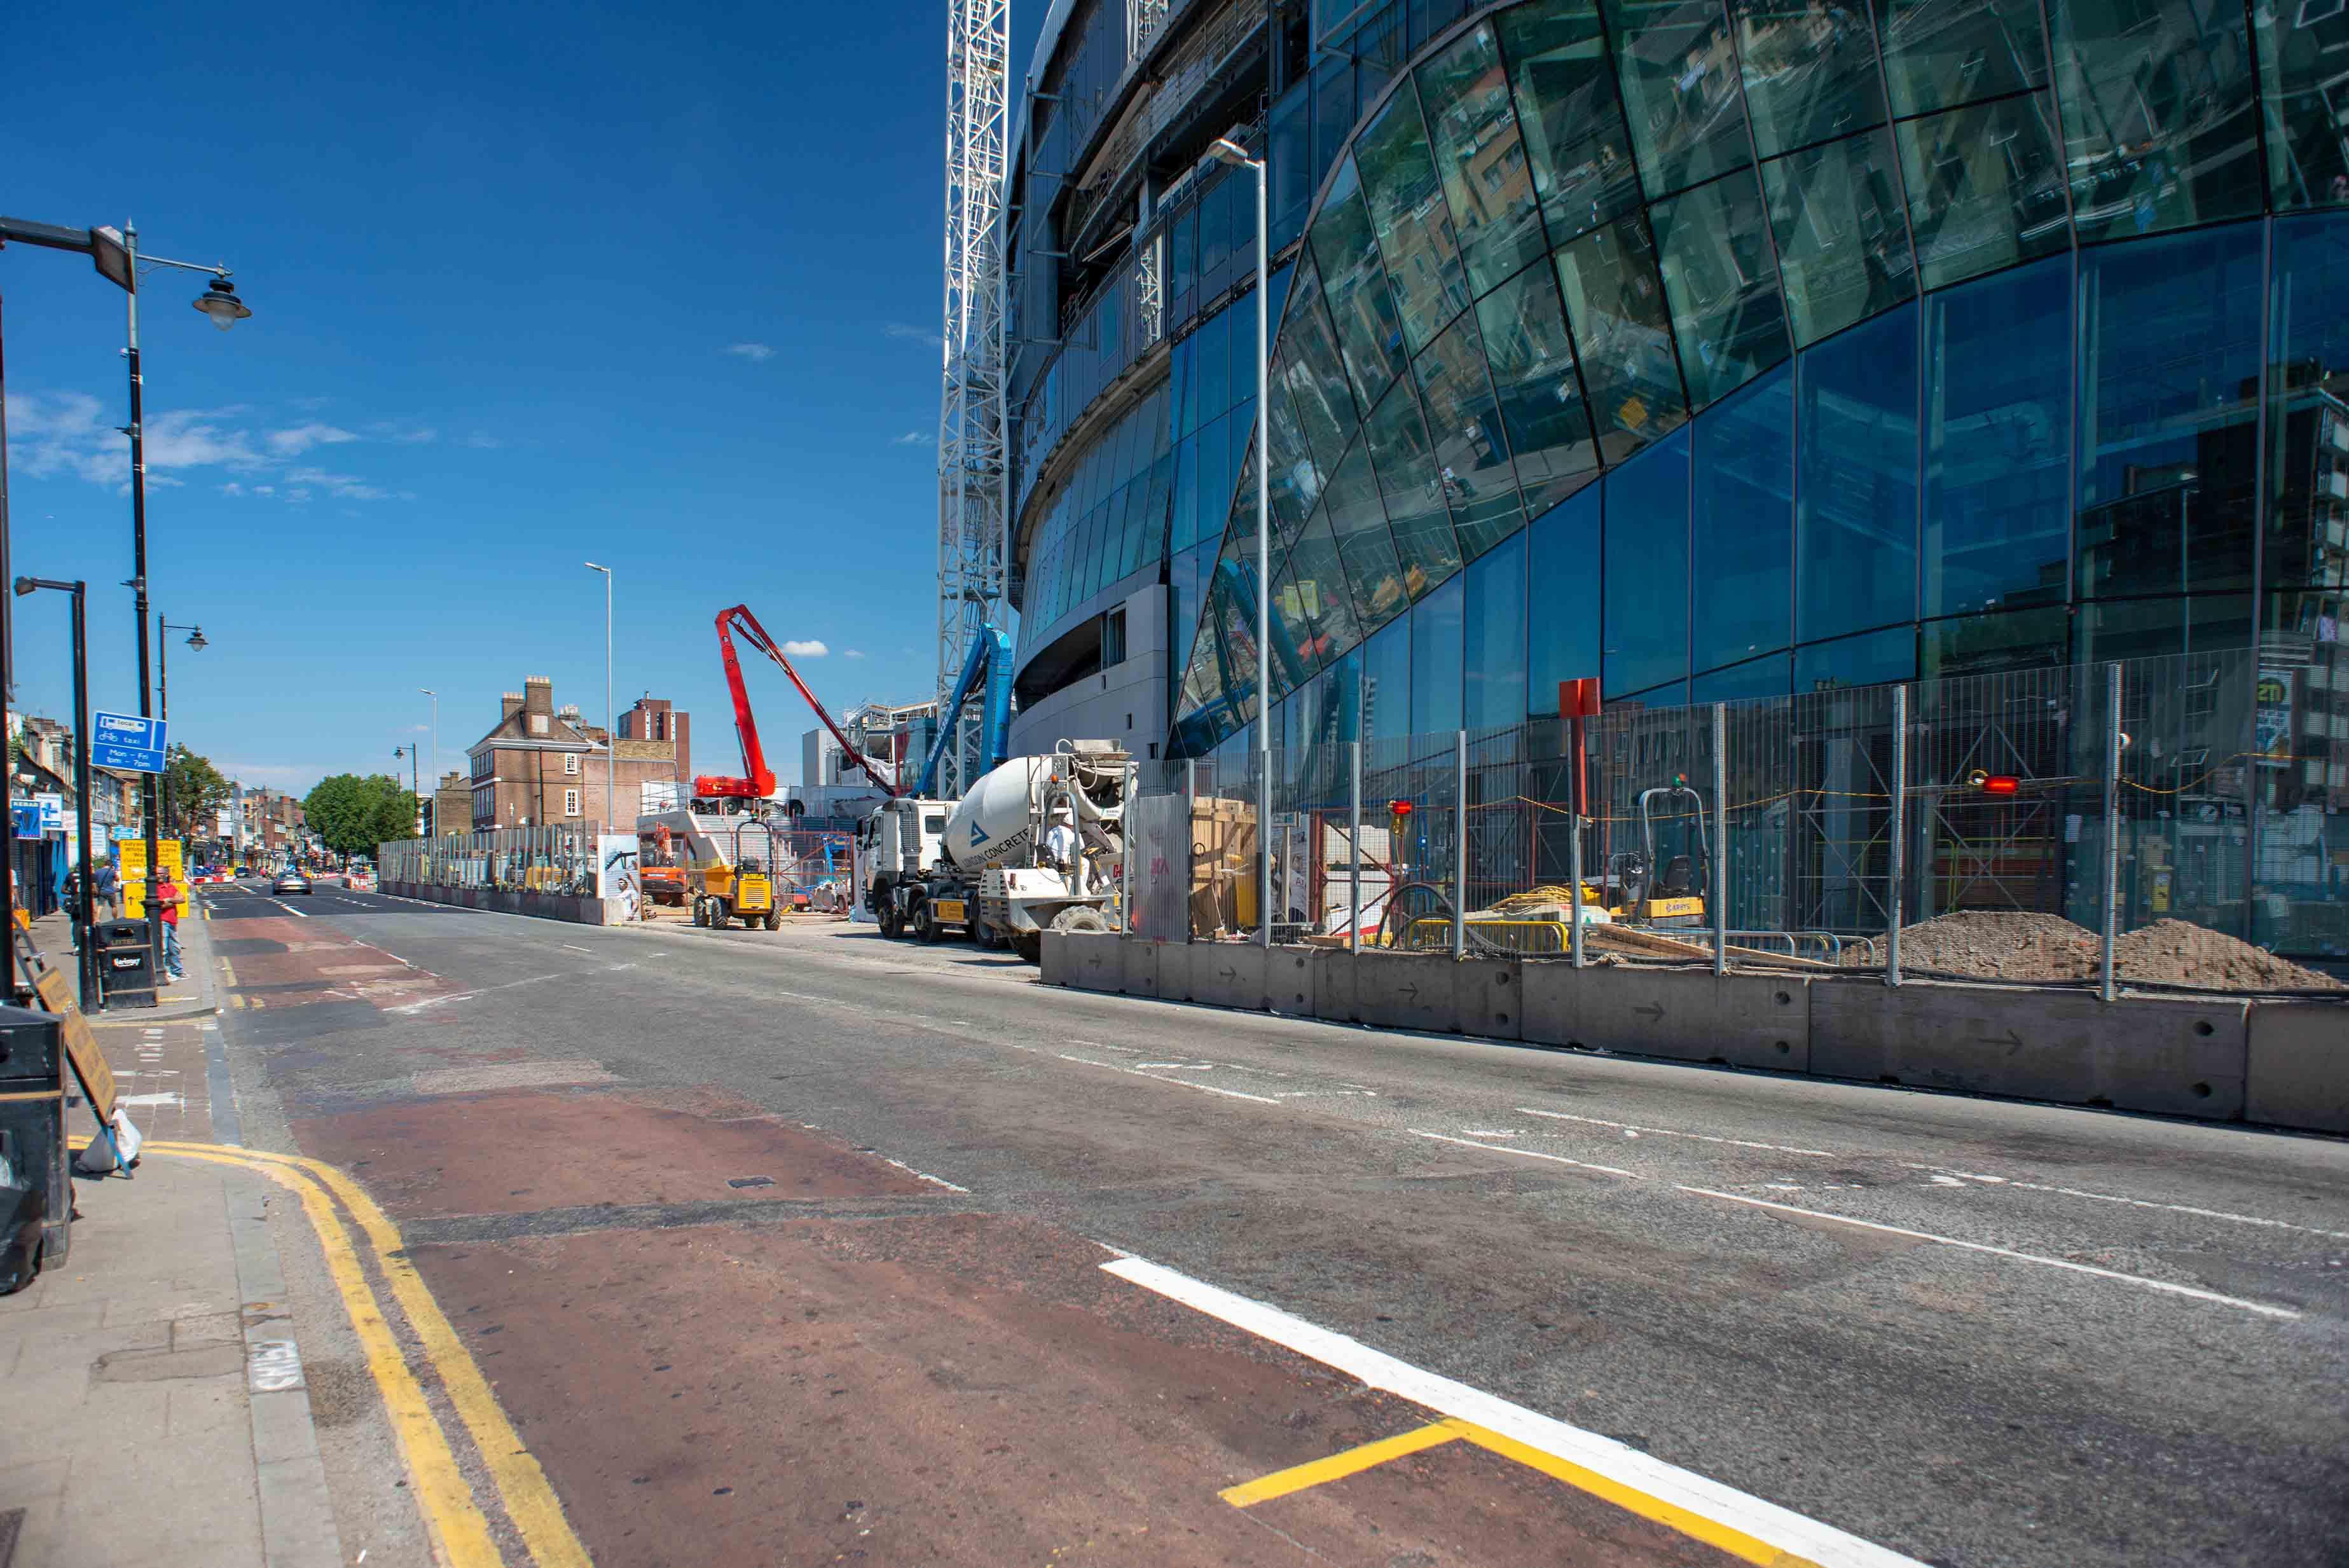 Construction site along-side the White Hart Lane stadium